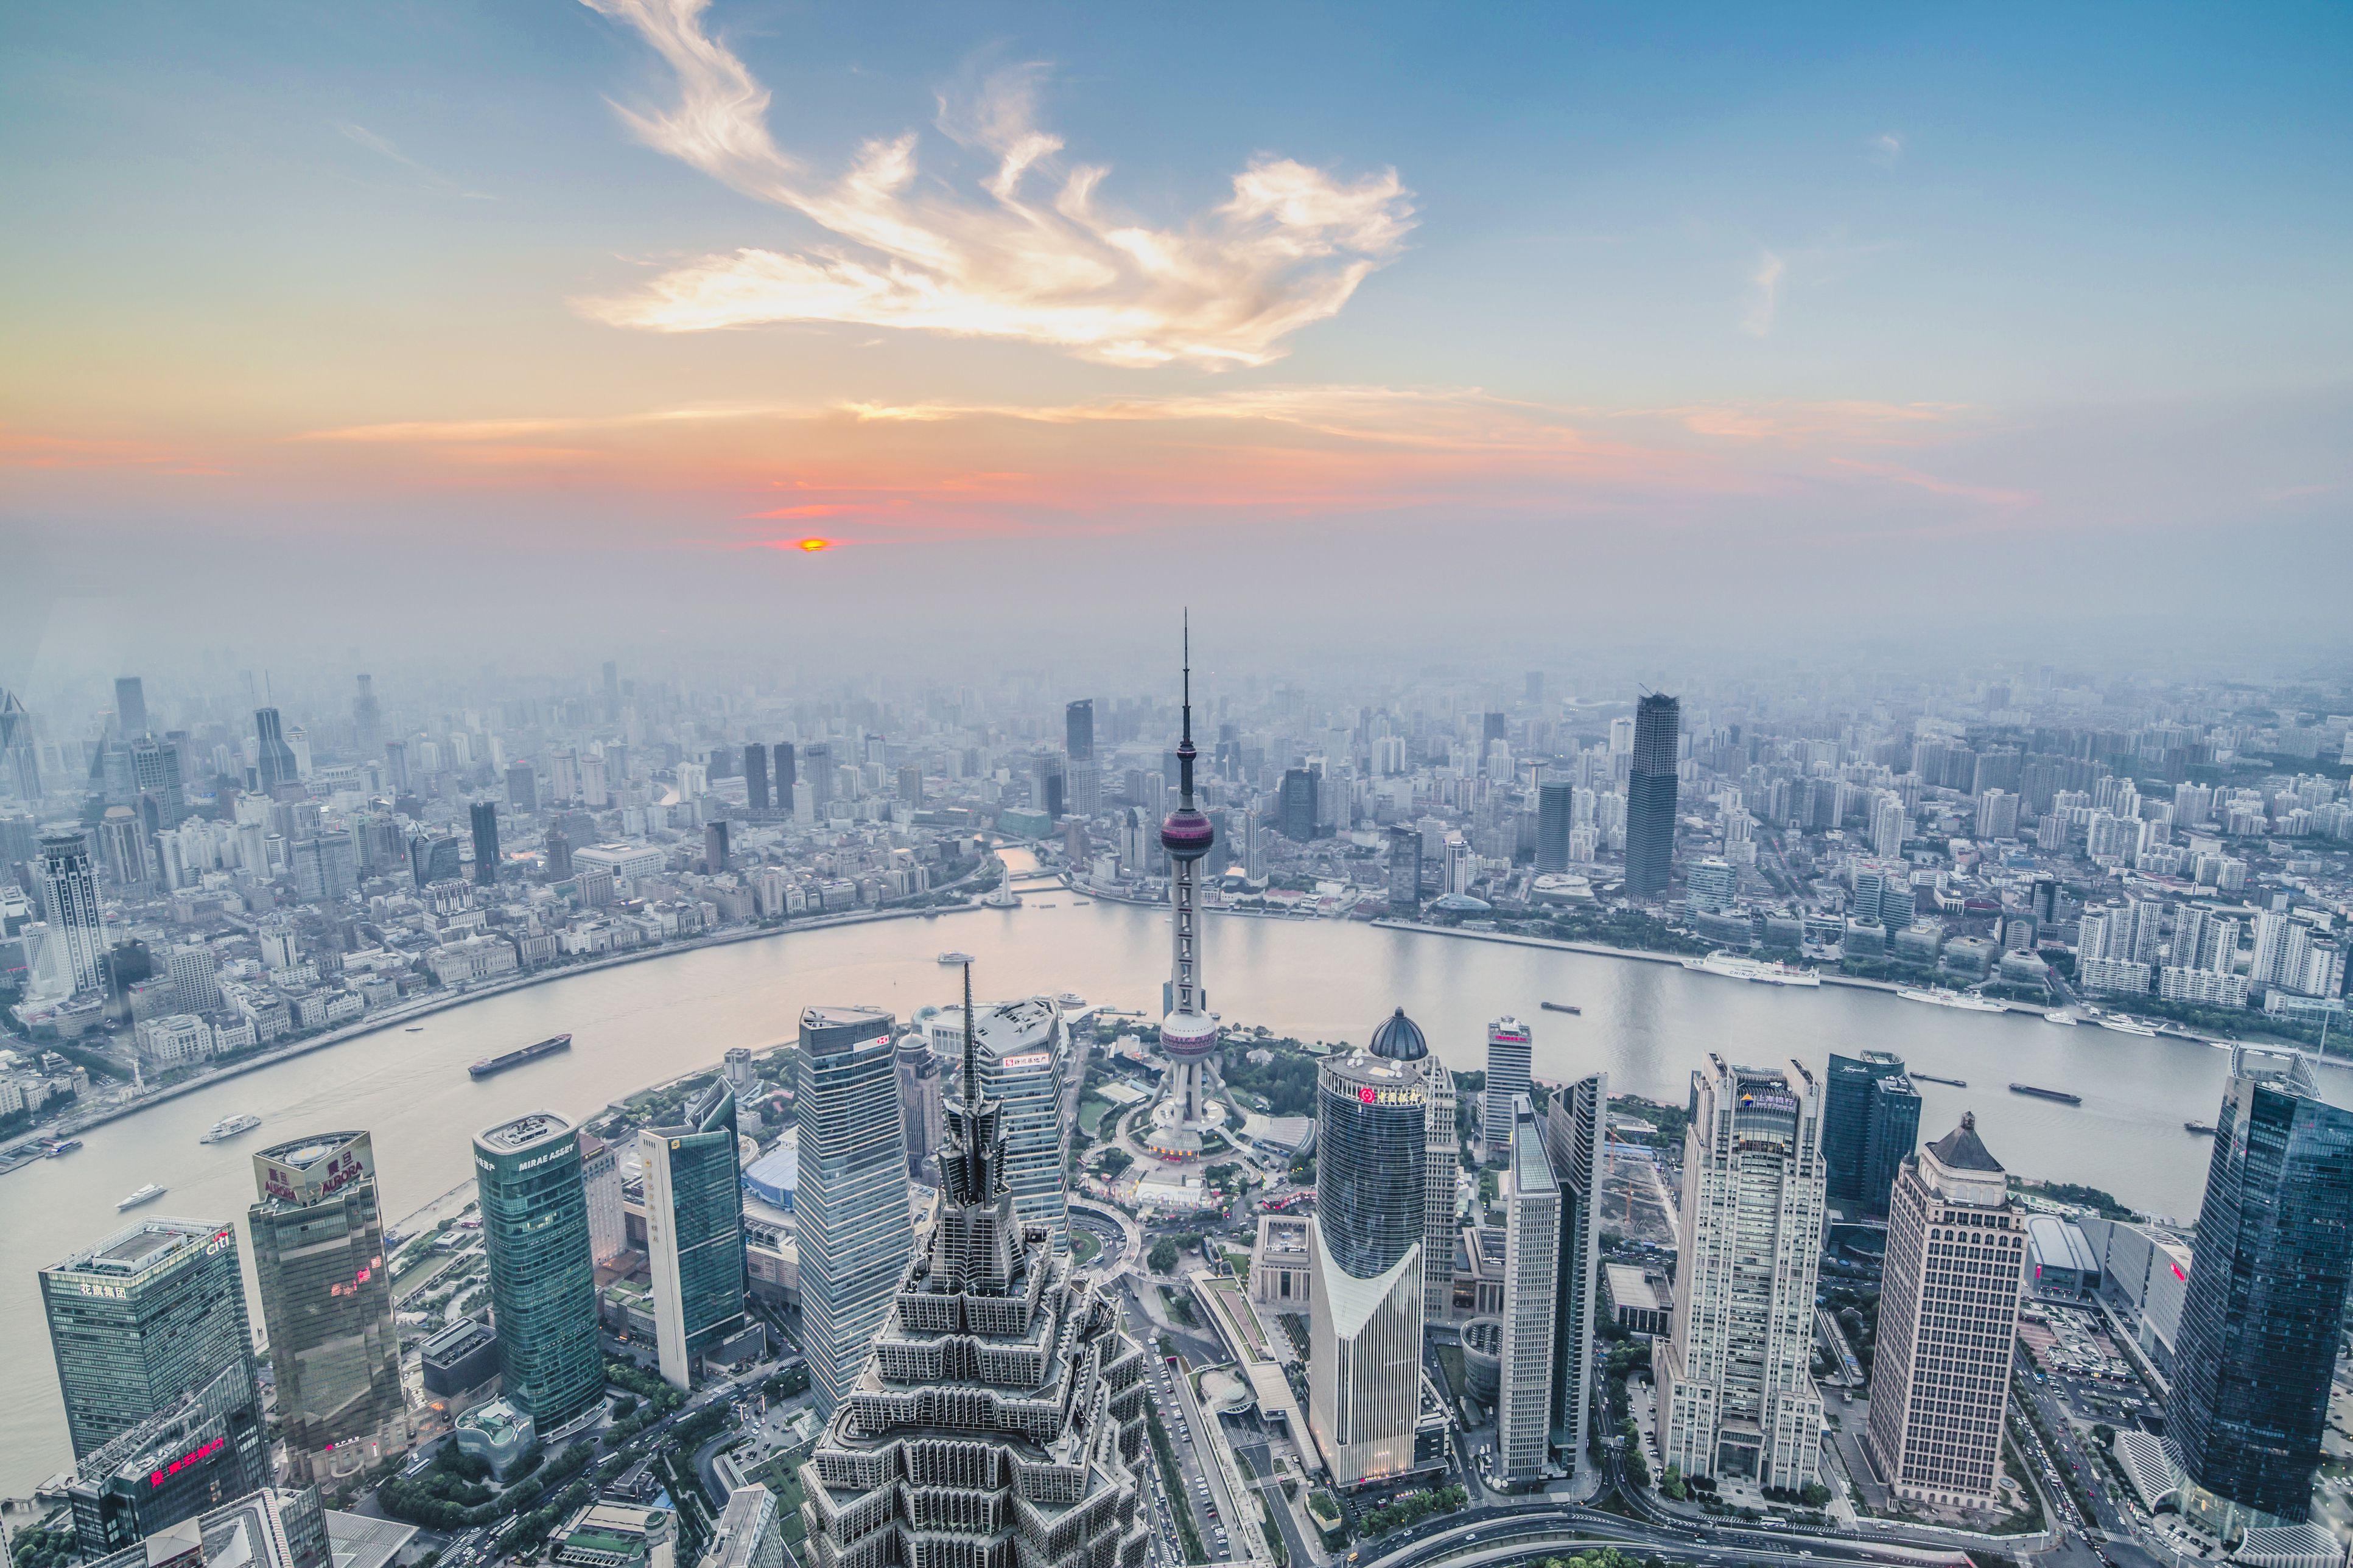 Aerial view, Shanghai, China